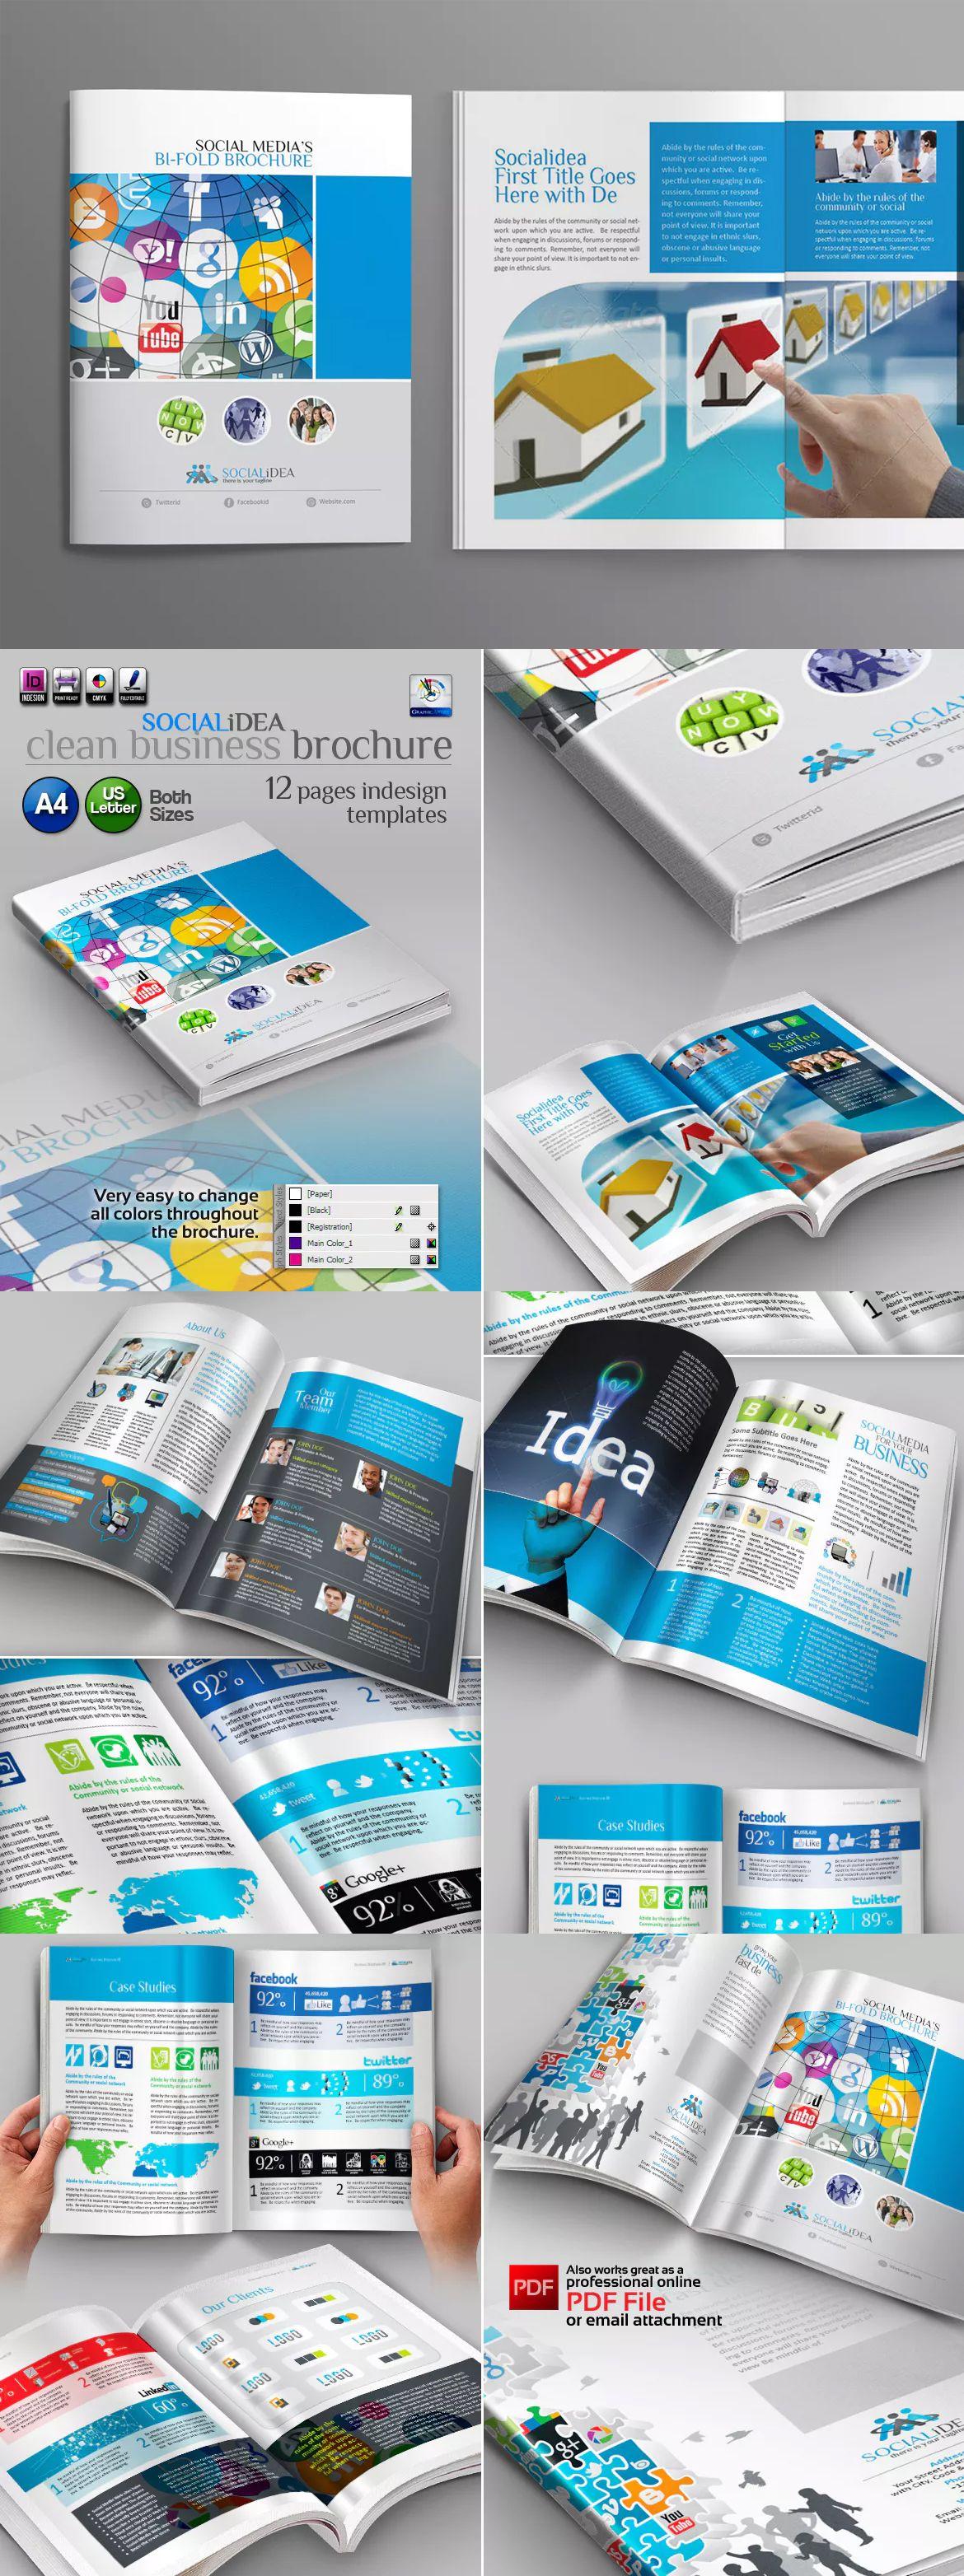 Social Media Brochure Template InDesign INDD - A4 & US Letter Size ...